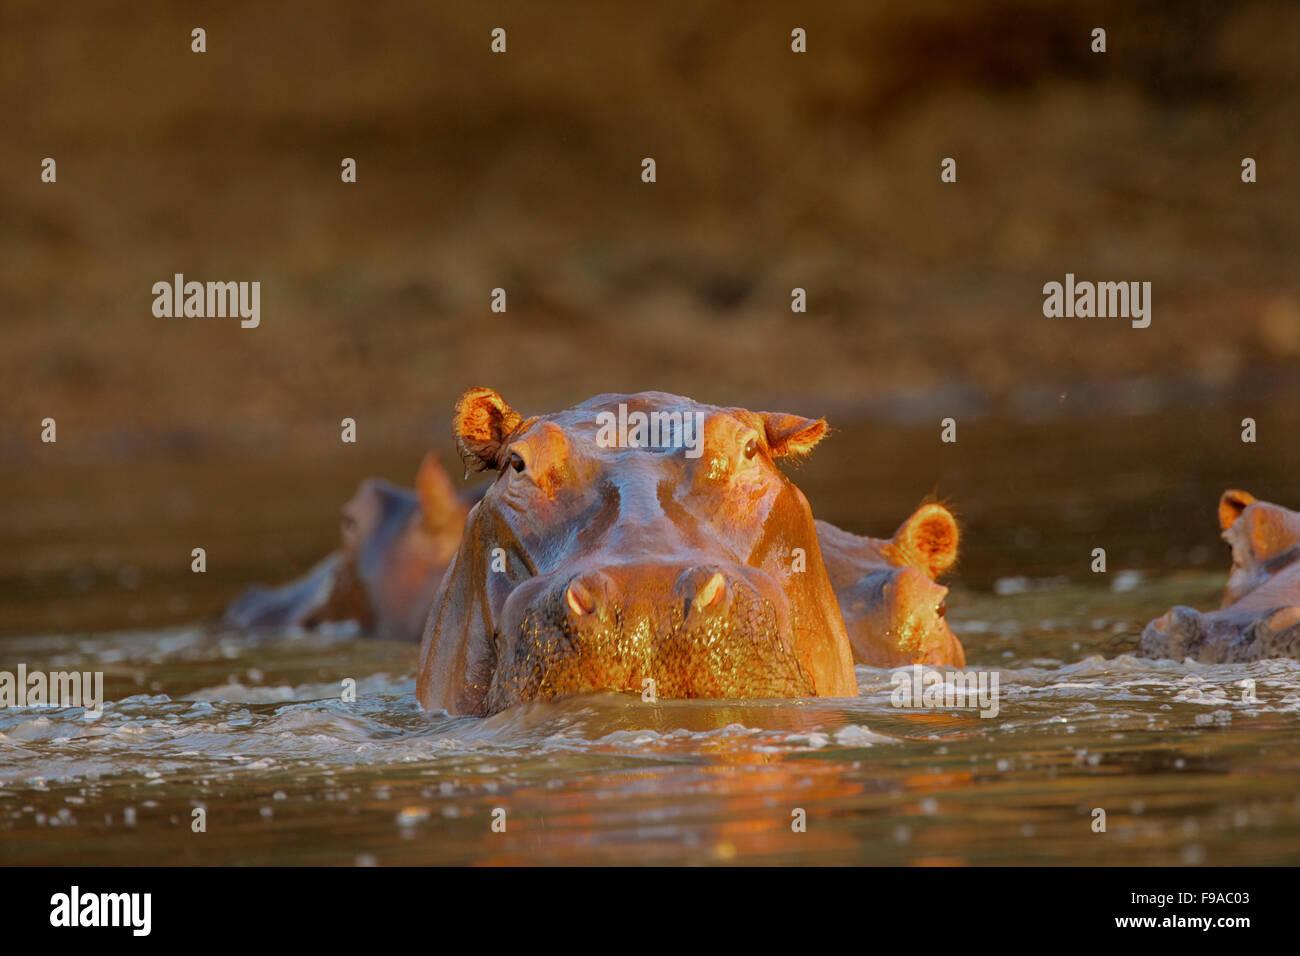 Ippopotamo, Mana Pools, Zimbabwe Immagini Stock